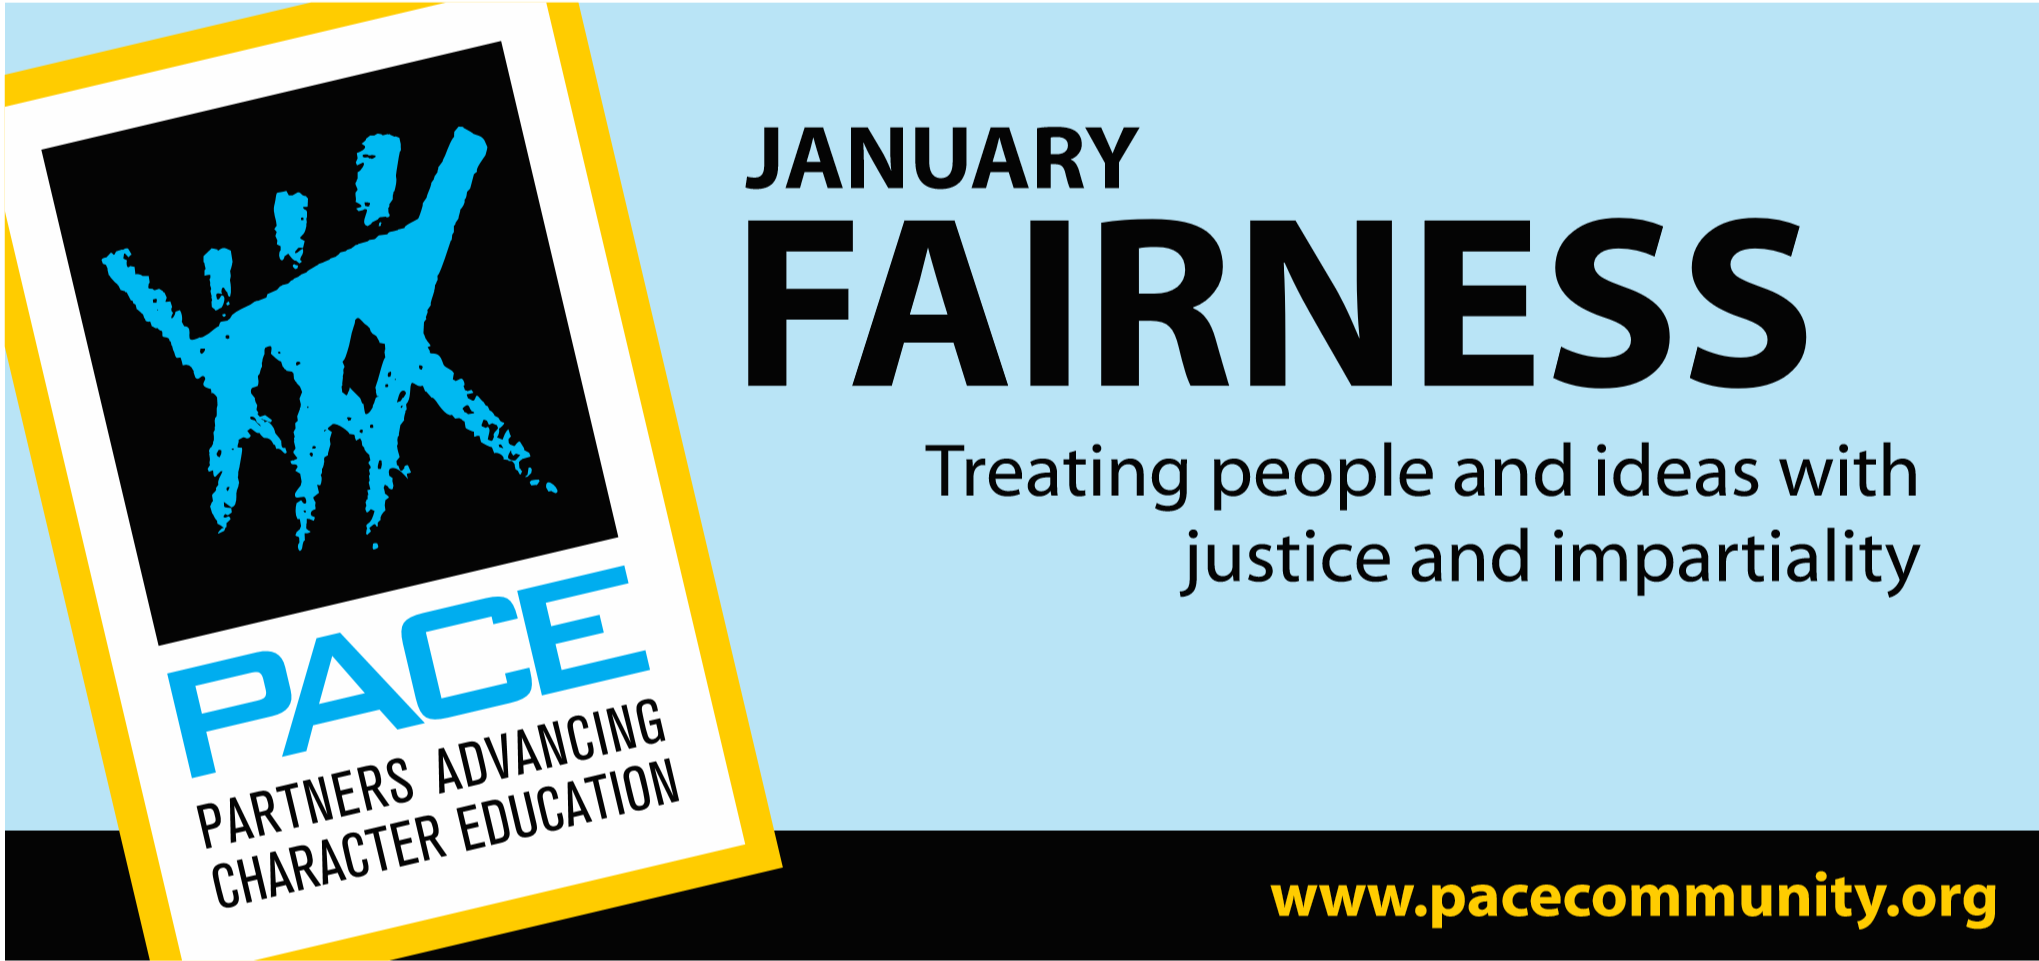 January Fairness